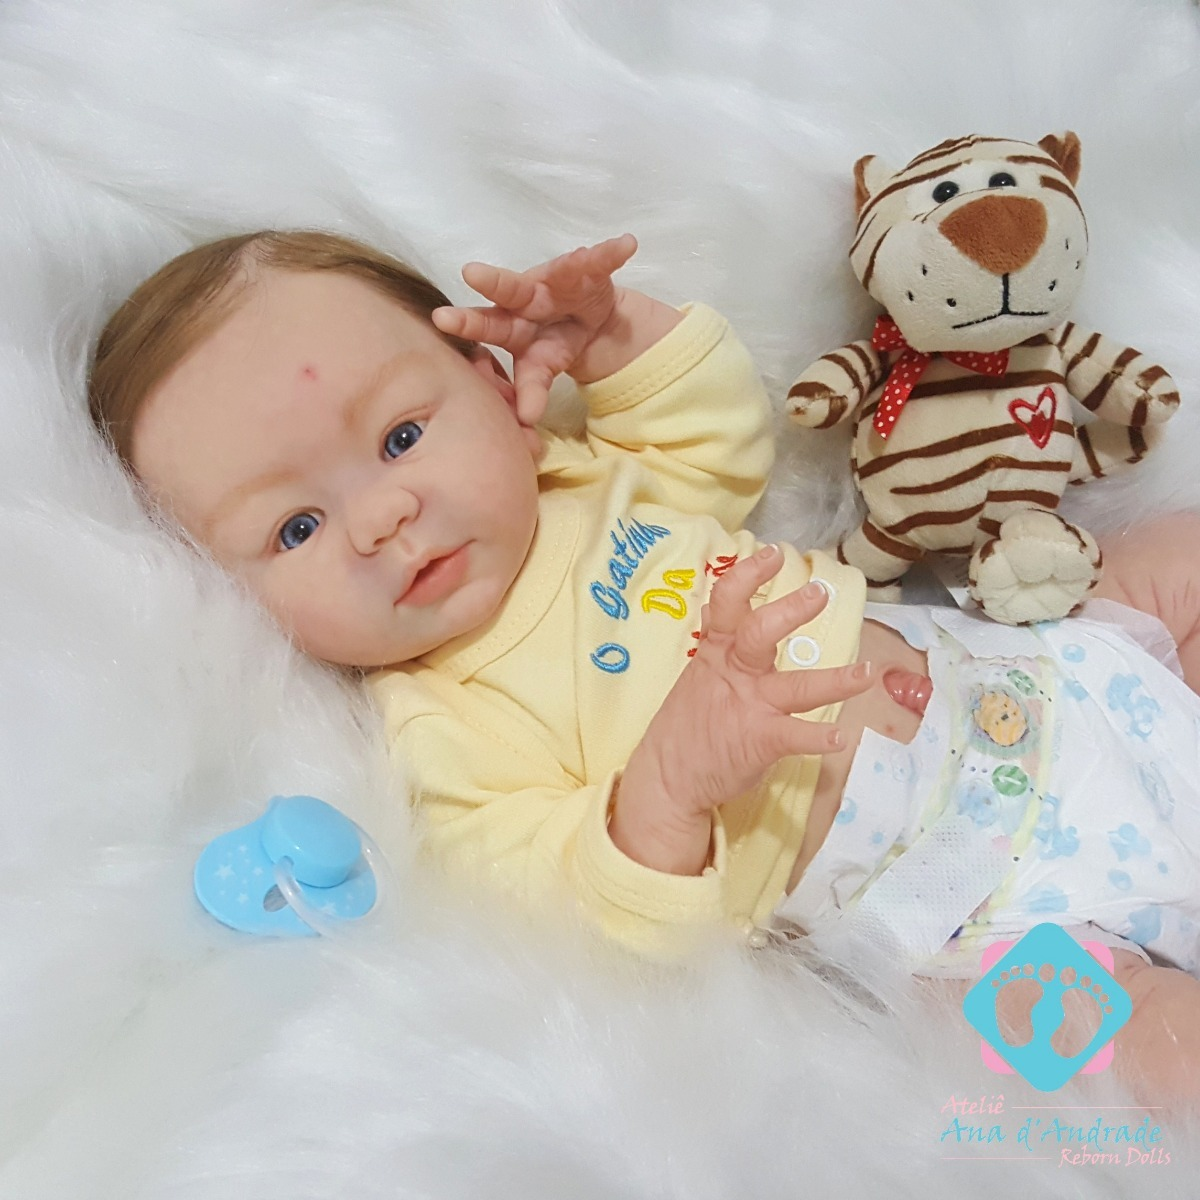 f50a27709 bebe reborn guilherme menino corpo inteiro vinil siliconado. Carregando  zoom.